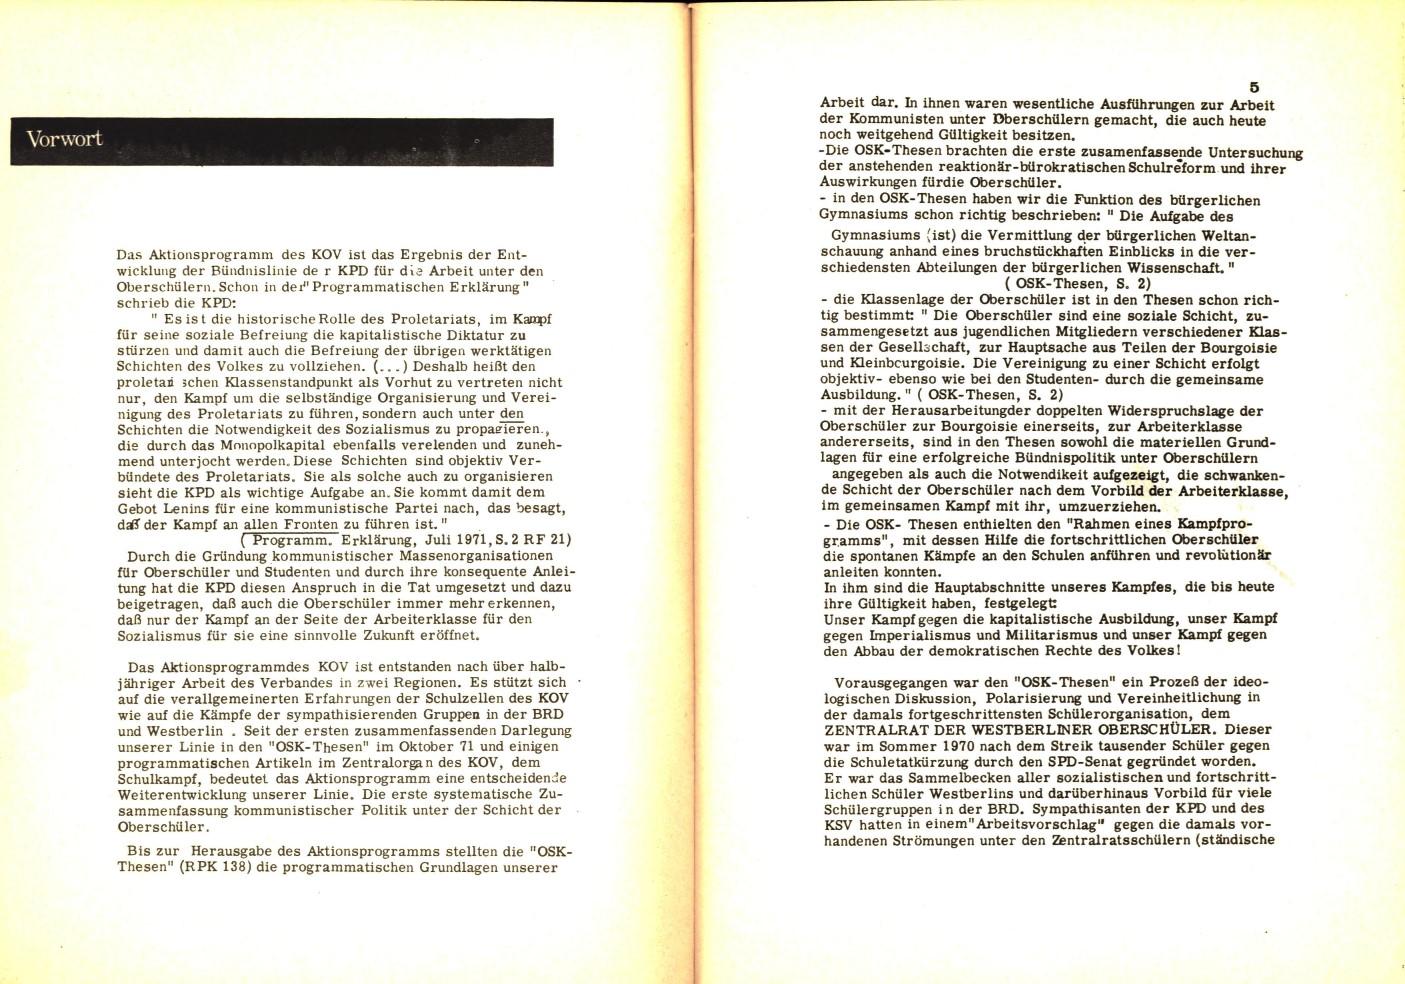 KOV_1973_Aktionsprogramm_05